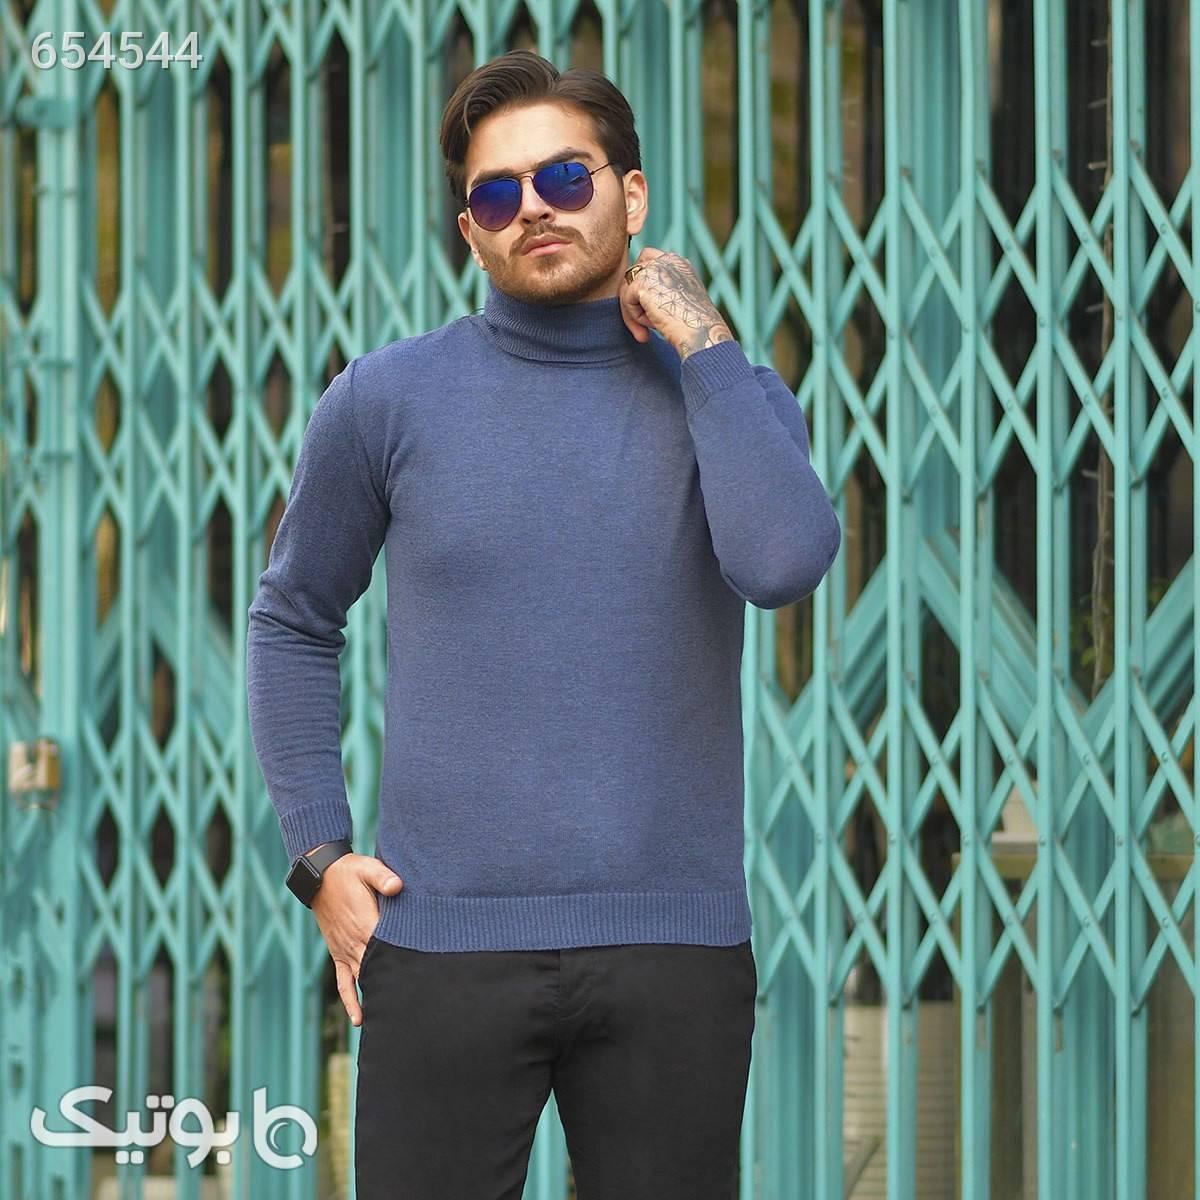 پليوربافت مردانه يقه اسكي مدل Tosan سورمه ای پليور و ژاکت مردانه